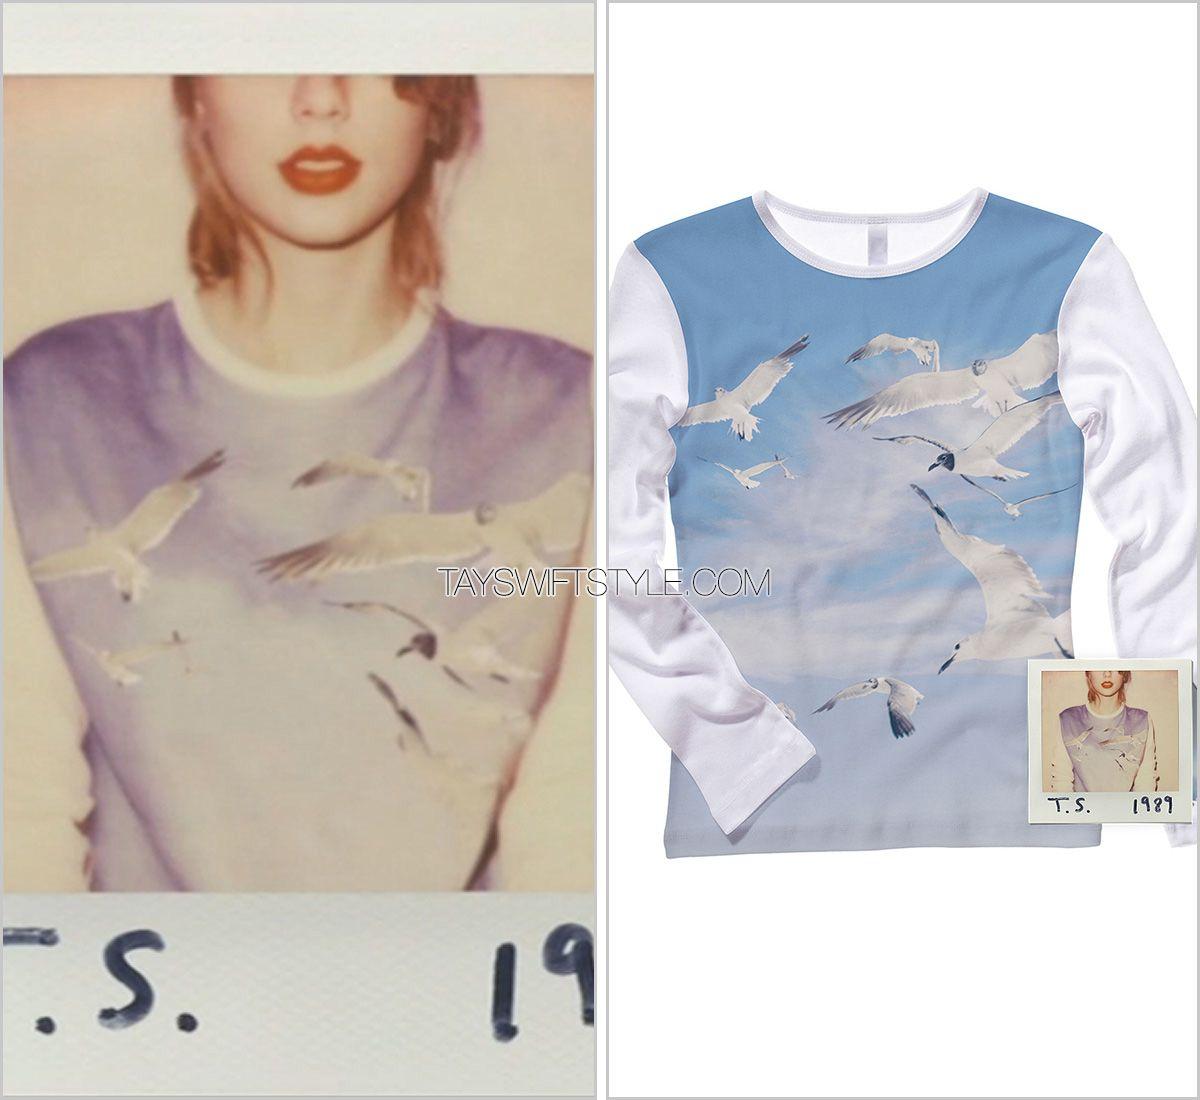 Taylor Swift Style Taylor Swift Merchandise Taylor Swift Style Taylor Swift